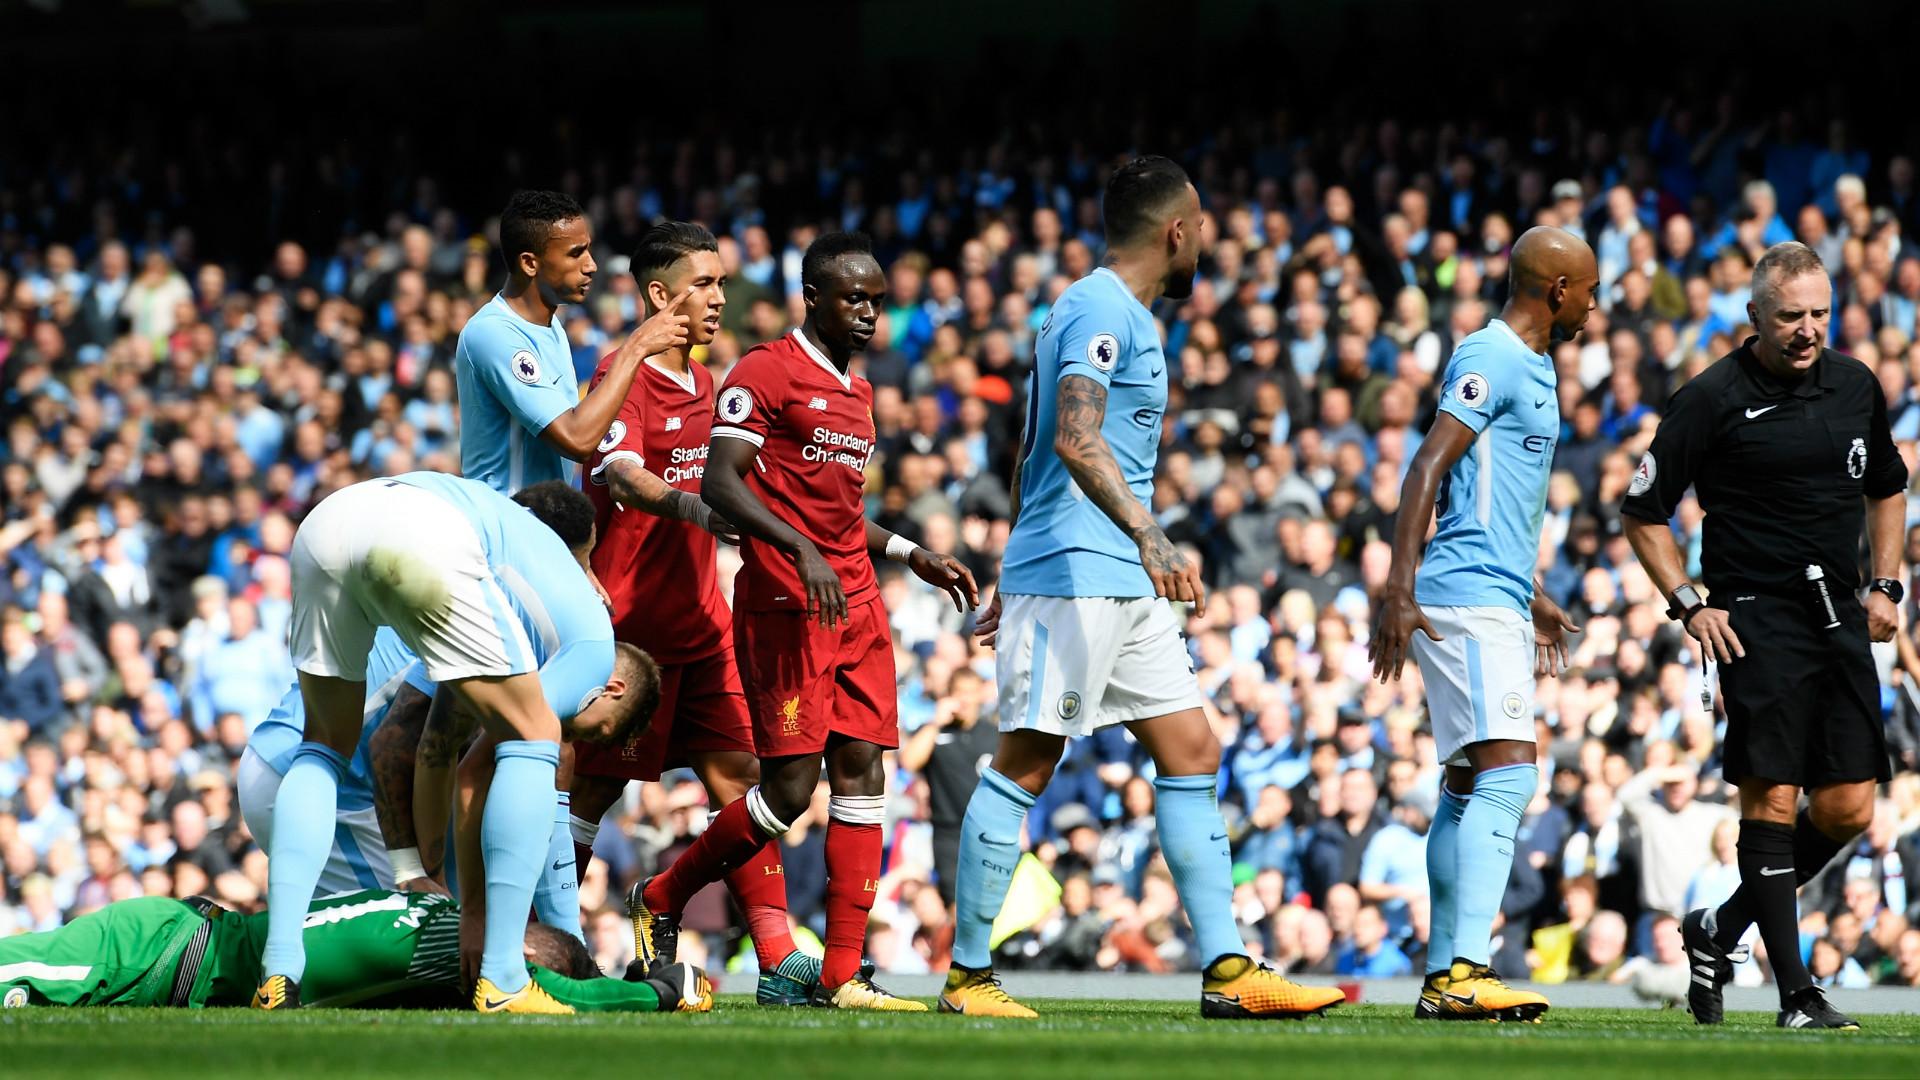 City Liverpool Mane red